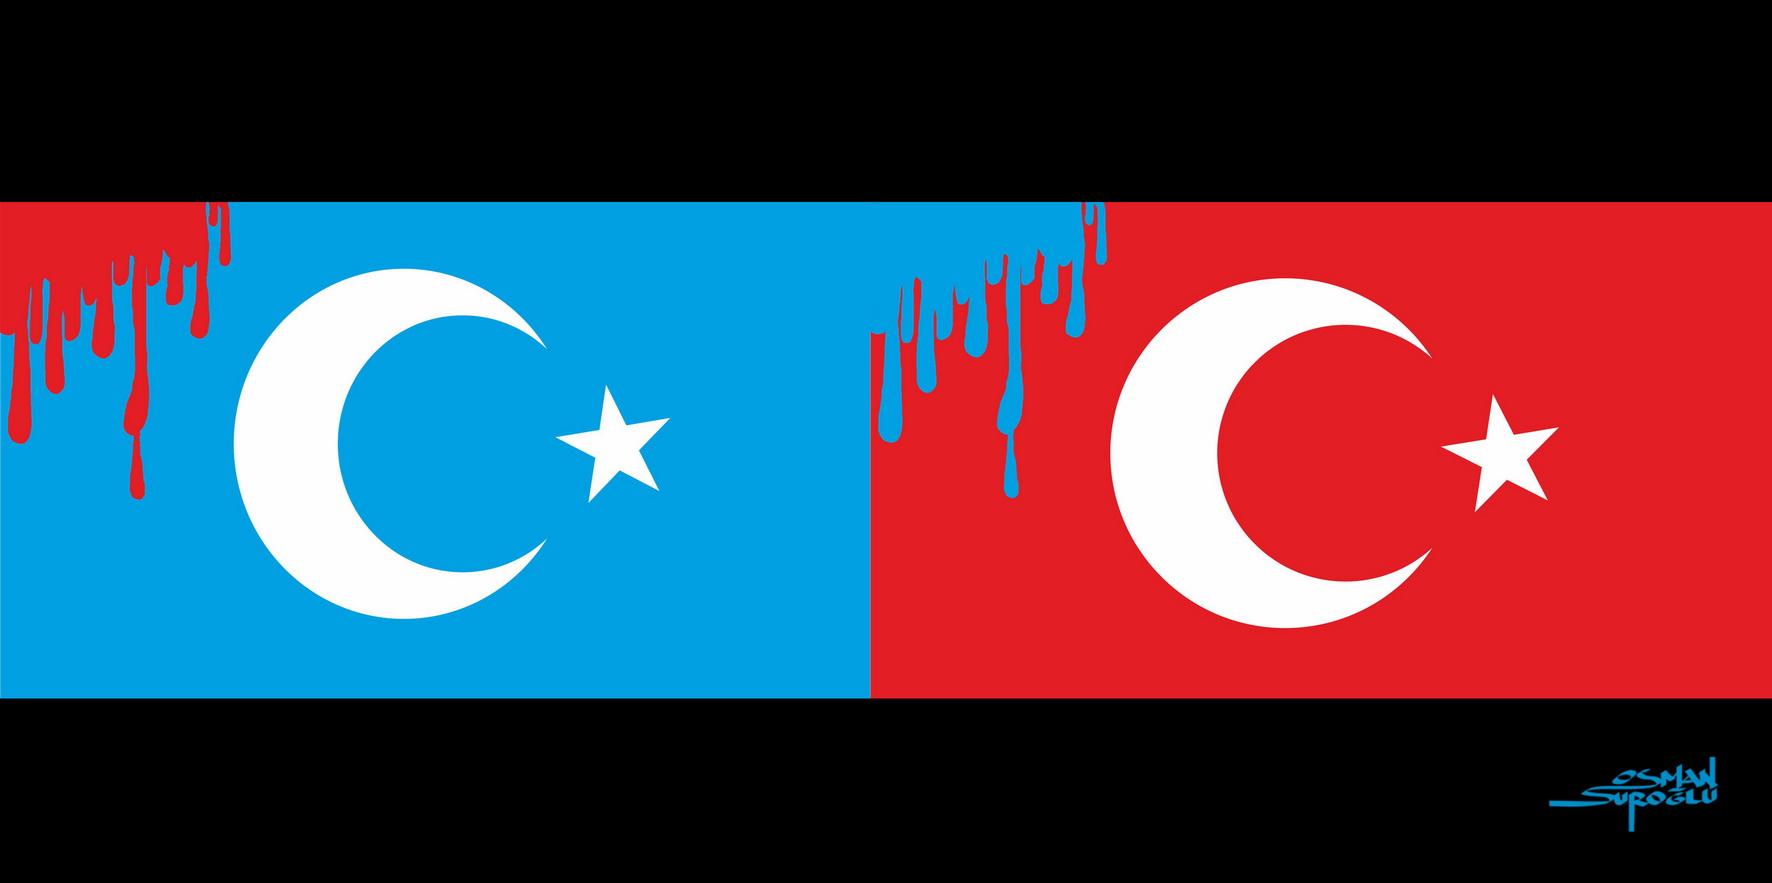 20150701-osman-suroglu-turkistan_resize.jpg